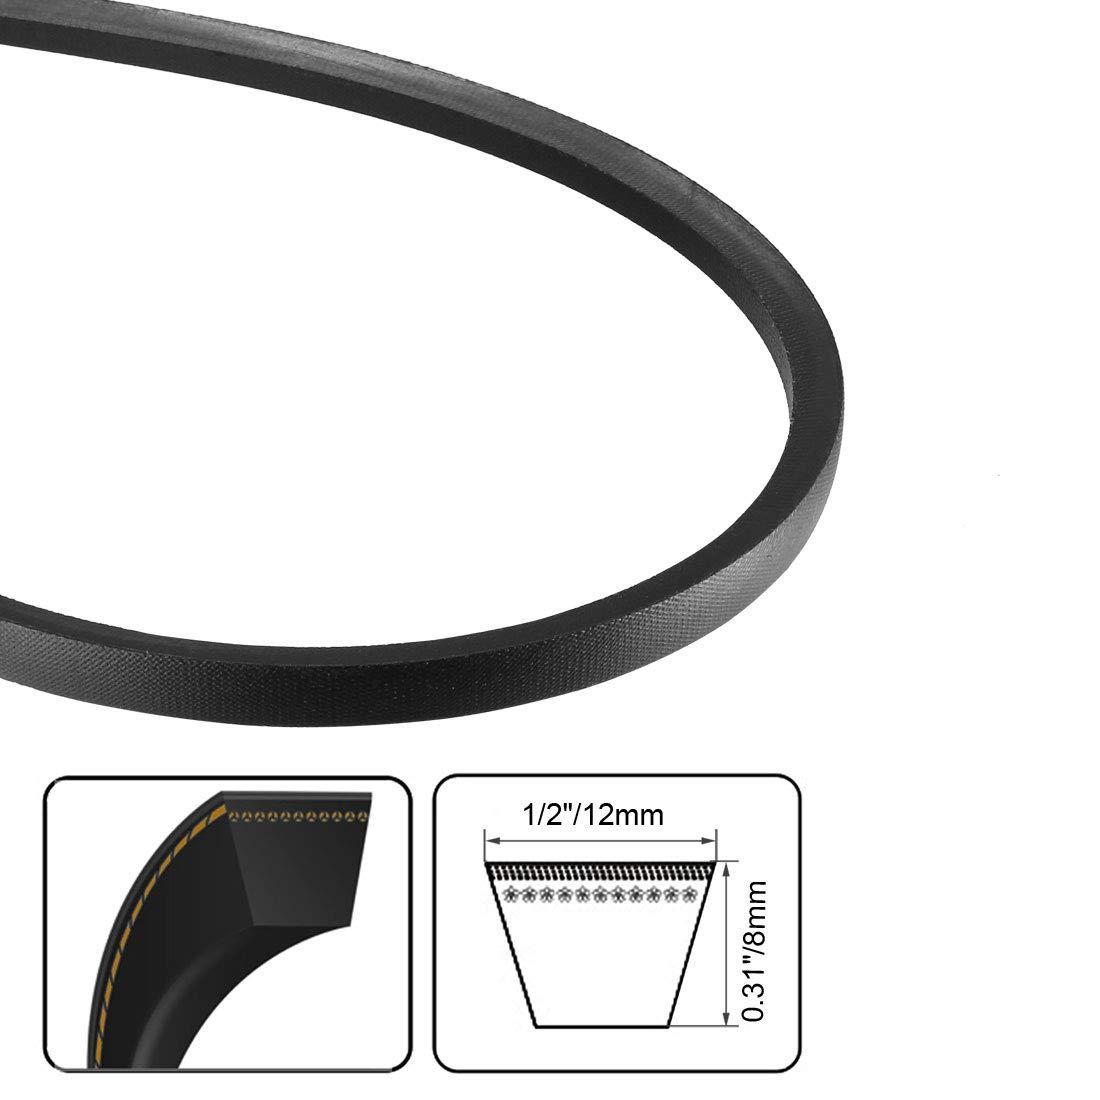 sourcing map A-50 Drive V-Belt Girth 50-inch Industrial Power Rubber Transmission Belt